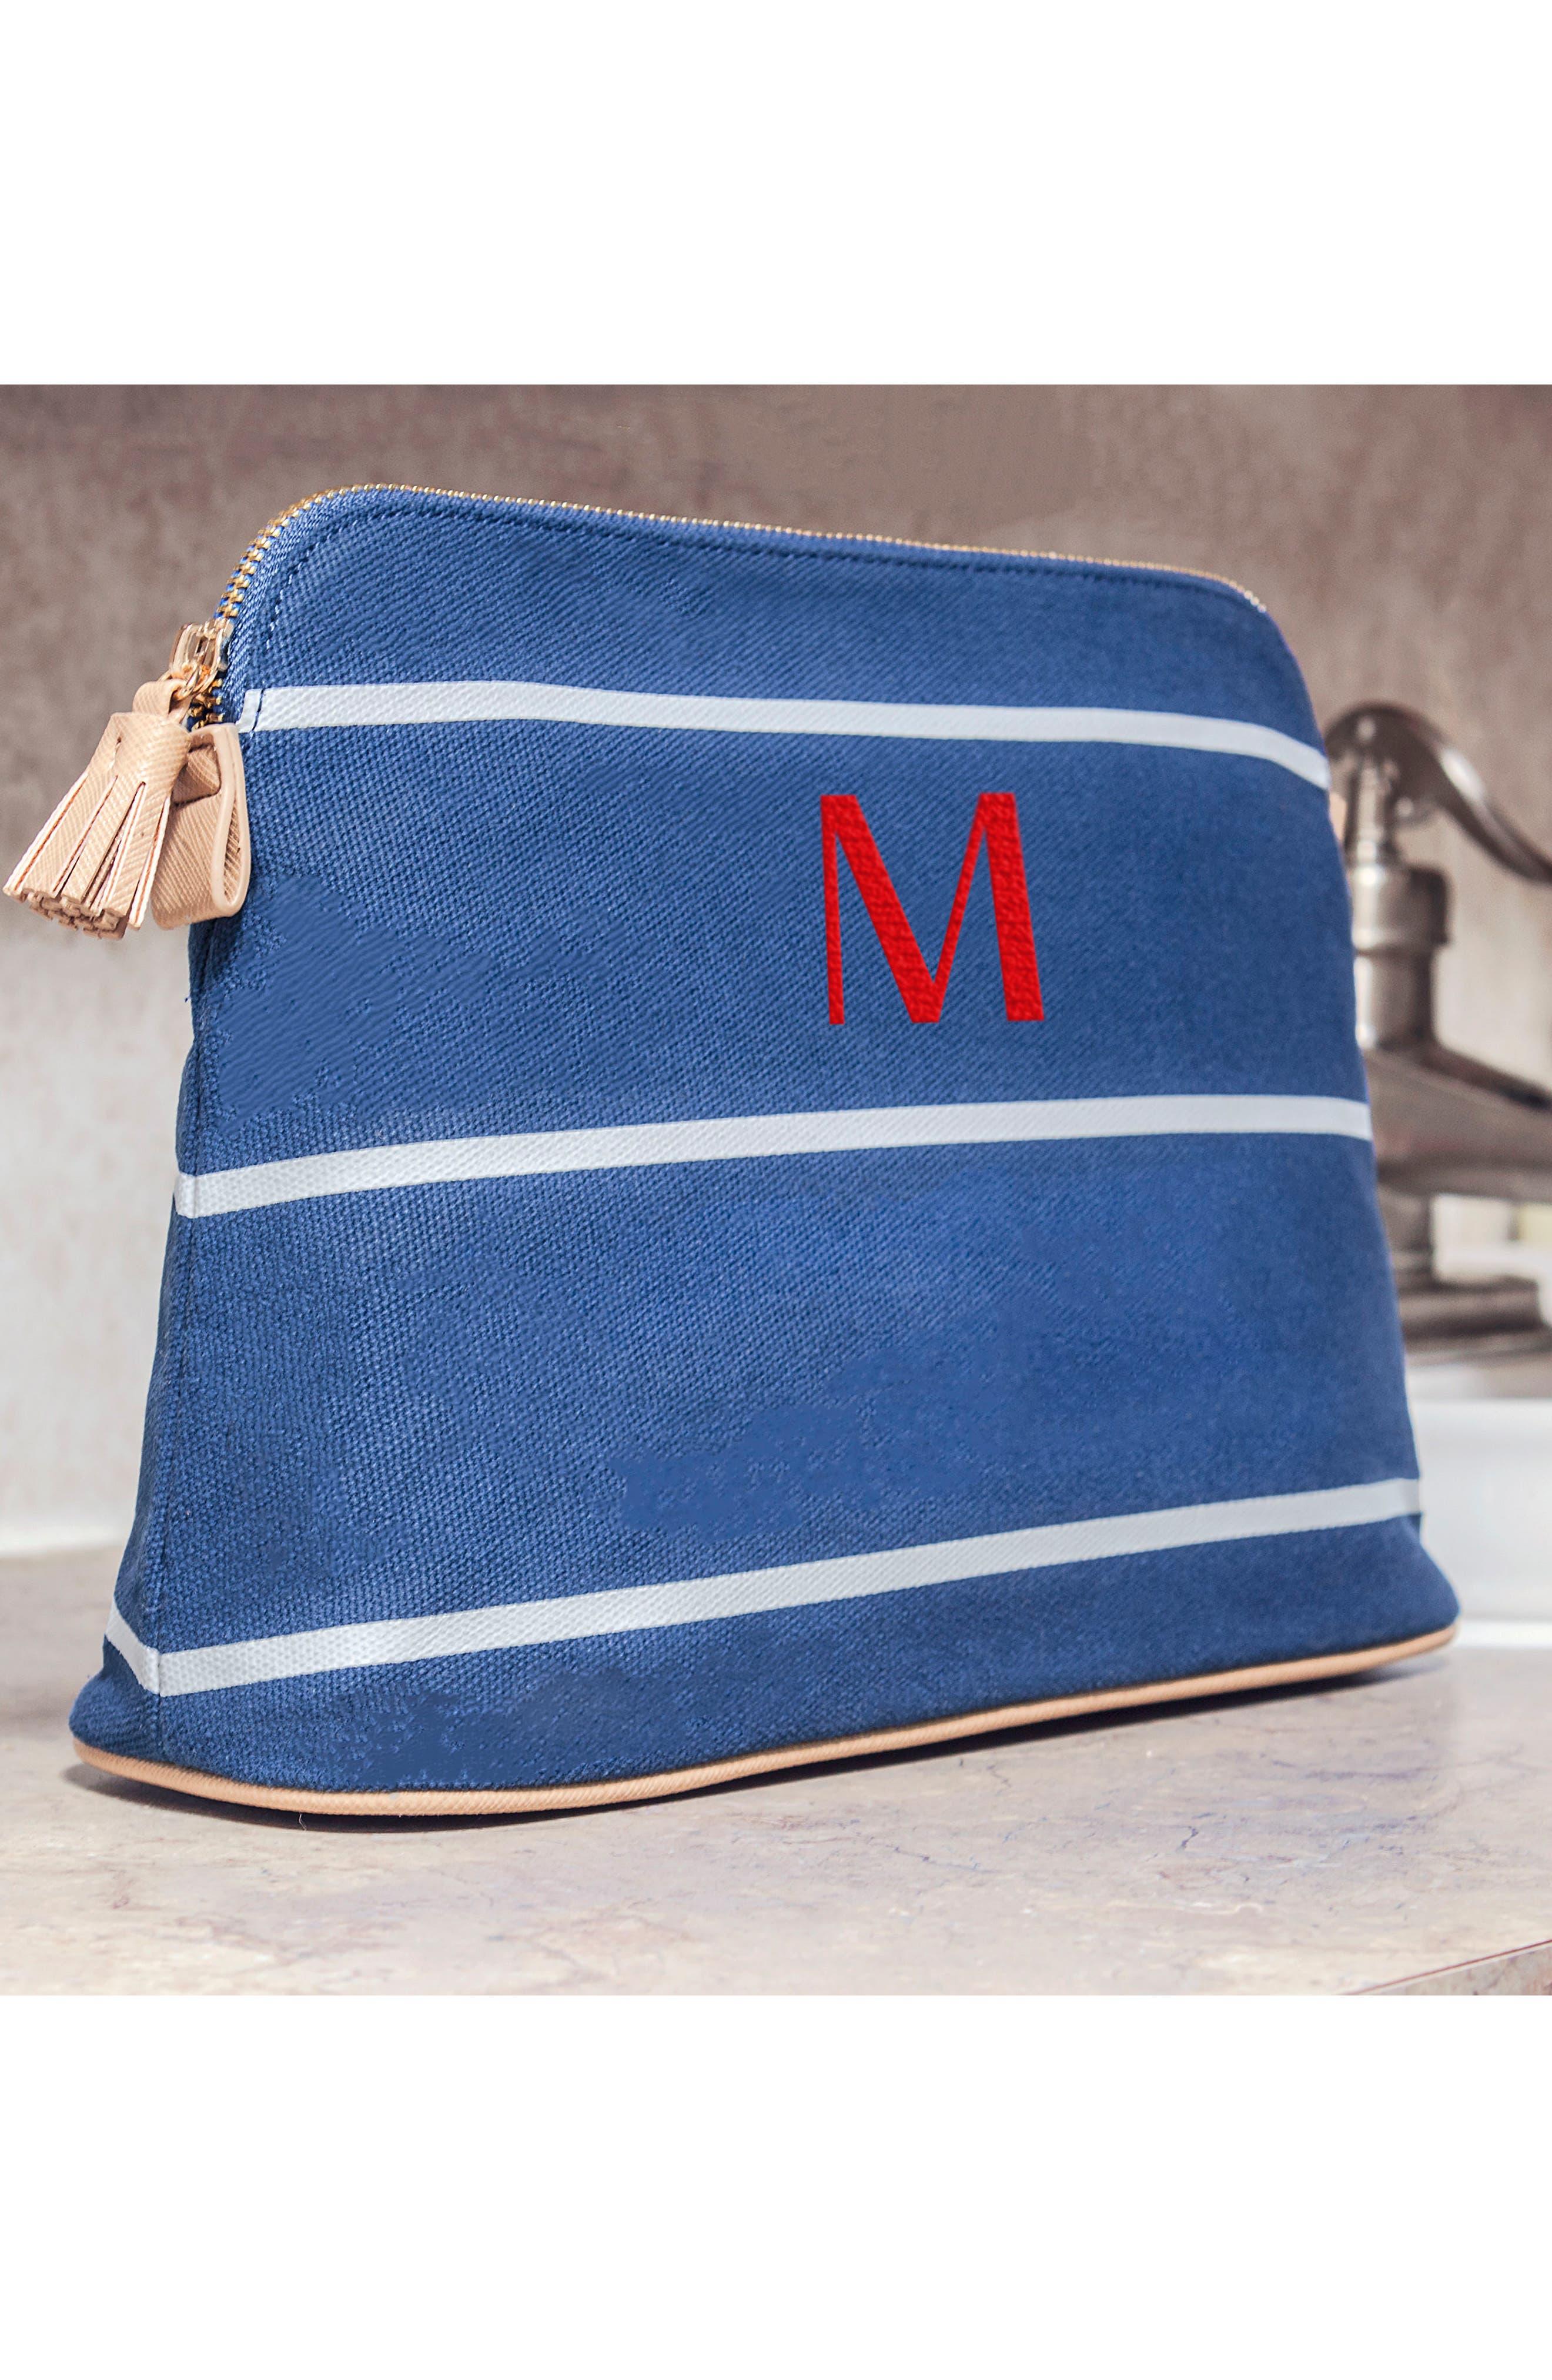 Monogram Cosmetics Bag,                             Alternate thumbnail 2, color,                             BLUE